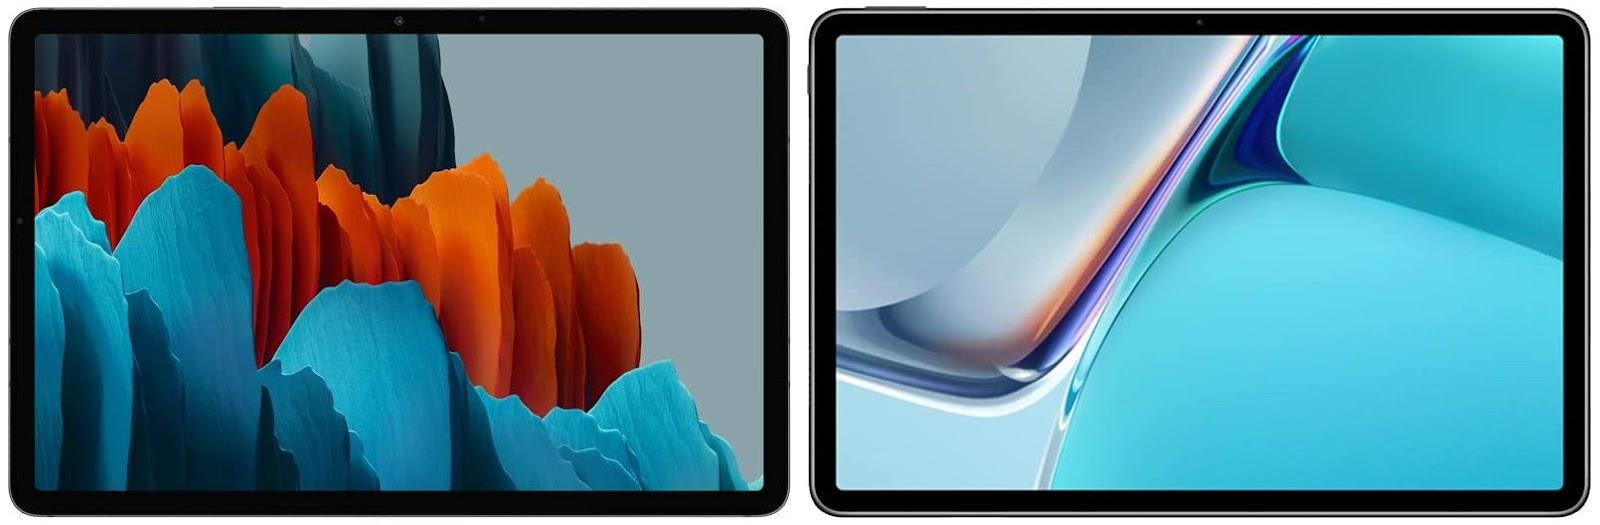 Samsung Galaxy Tab S7 vs Huawei MatePad 11 2021